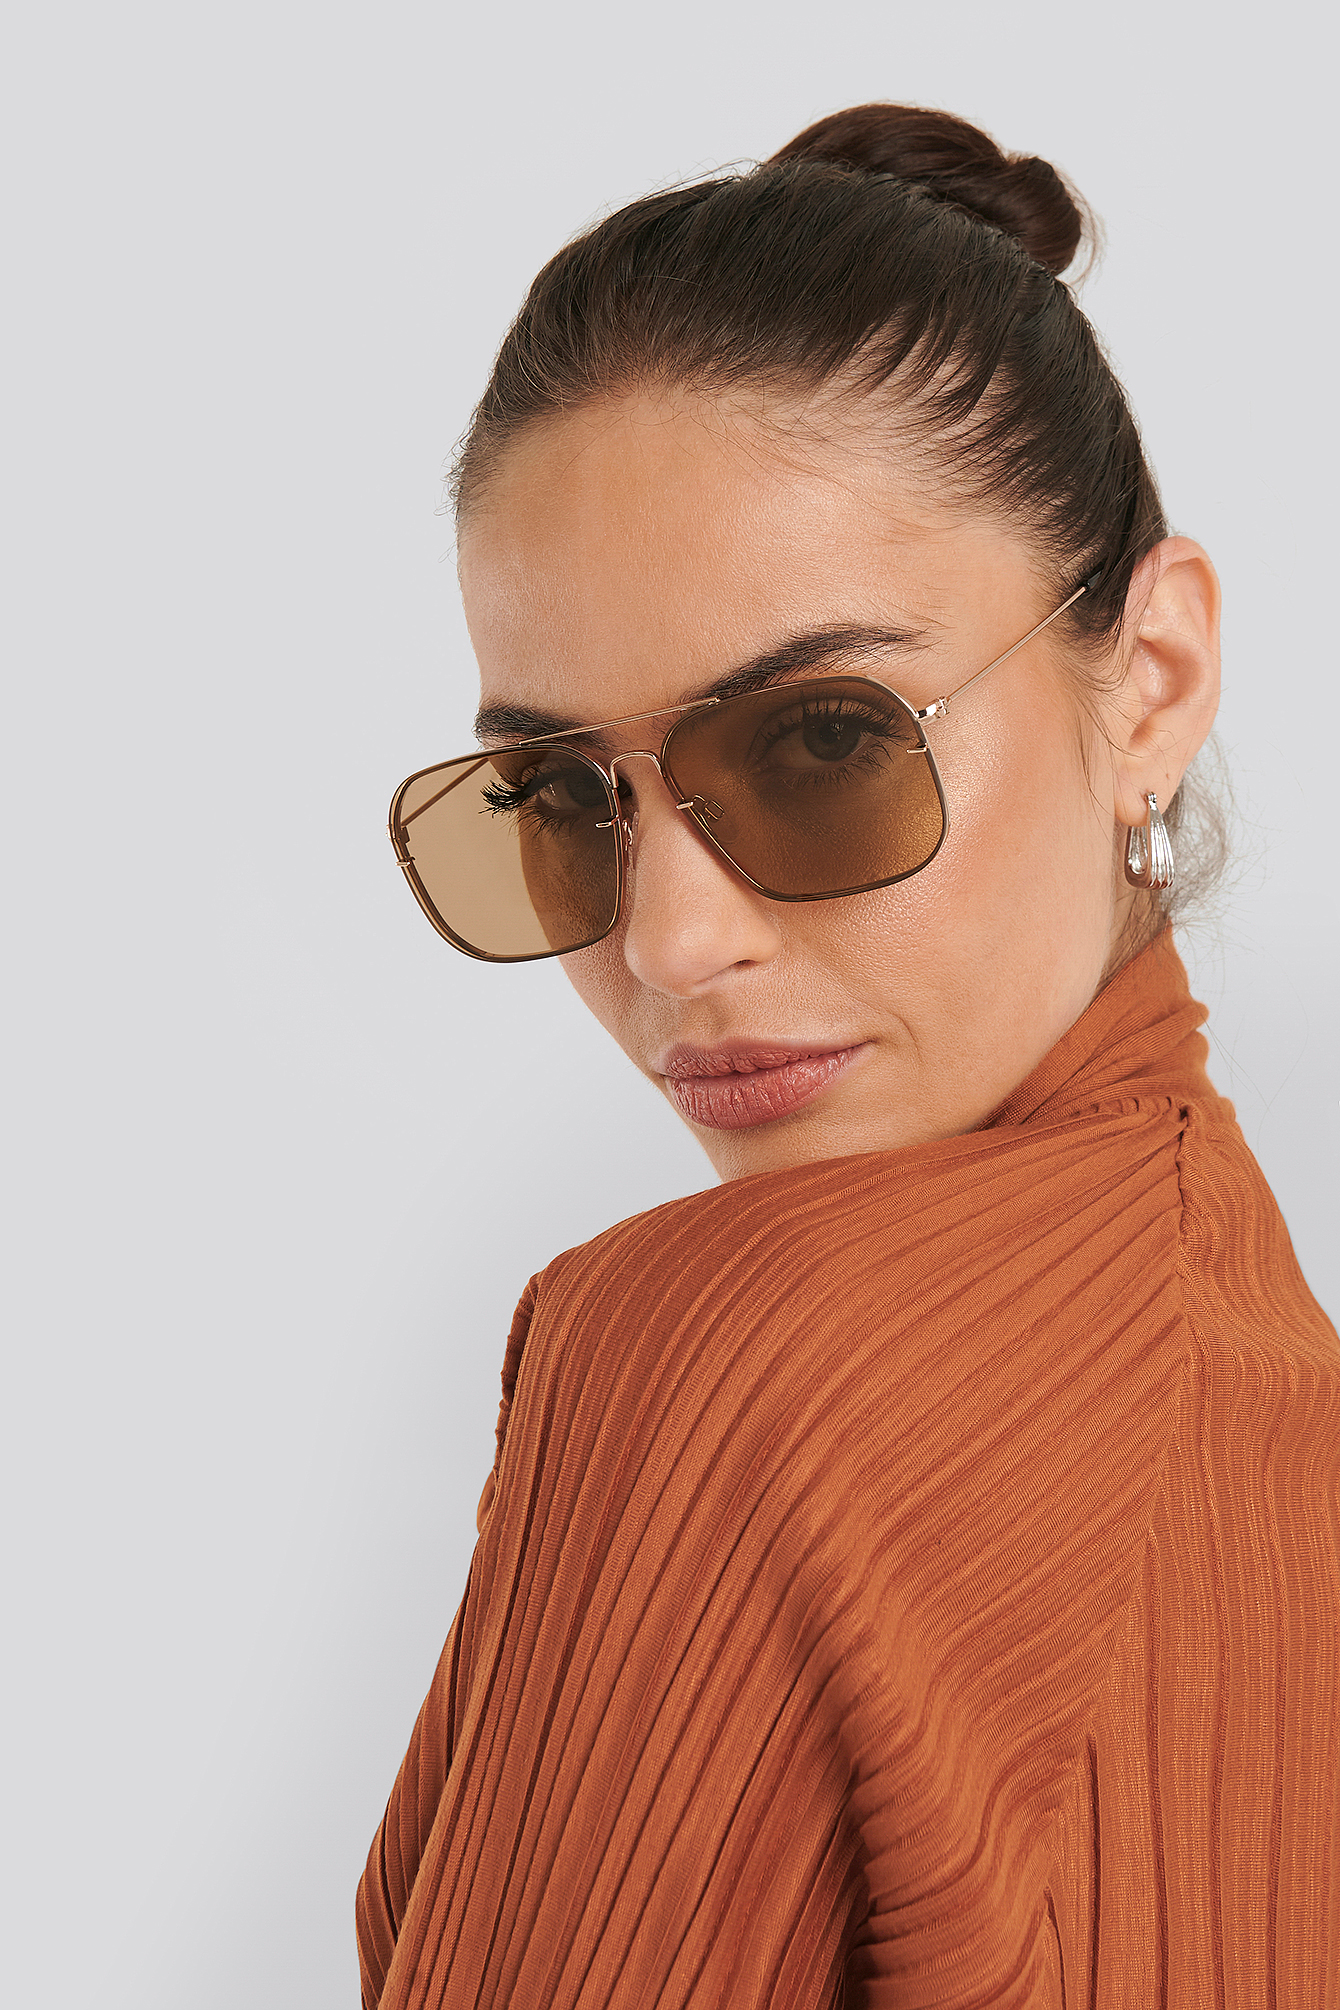 NA-KD Accessories Squared Wire Frame Sunglasses - Brown | Accessoires > Sonnenbrillen > Sonstige Sonnenbrillen | NA-KD Accessories